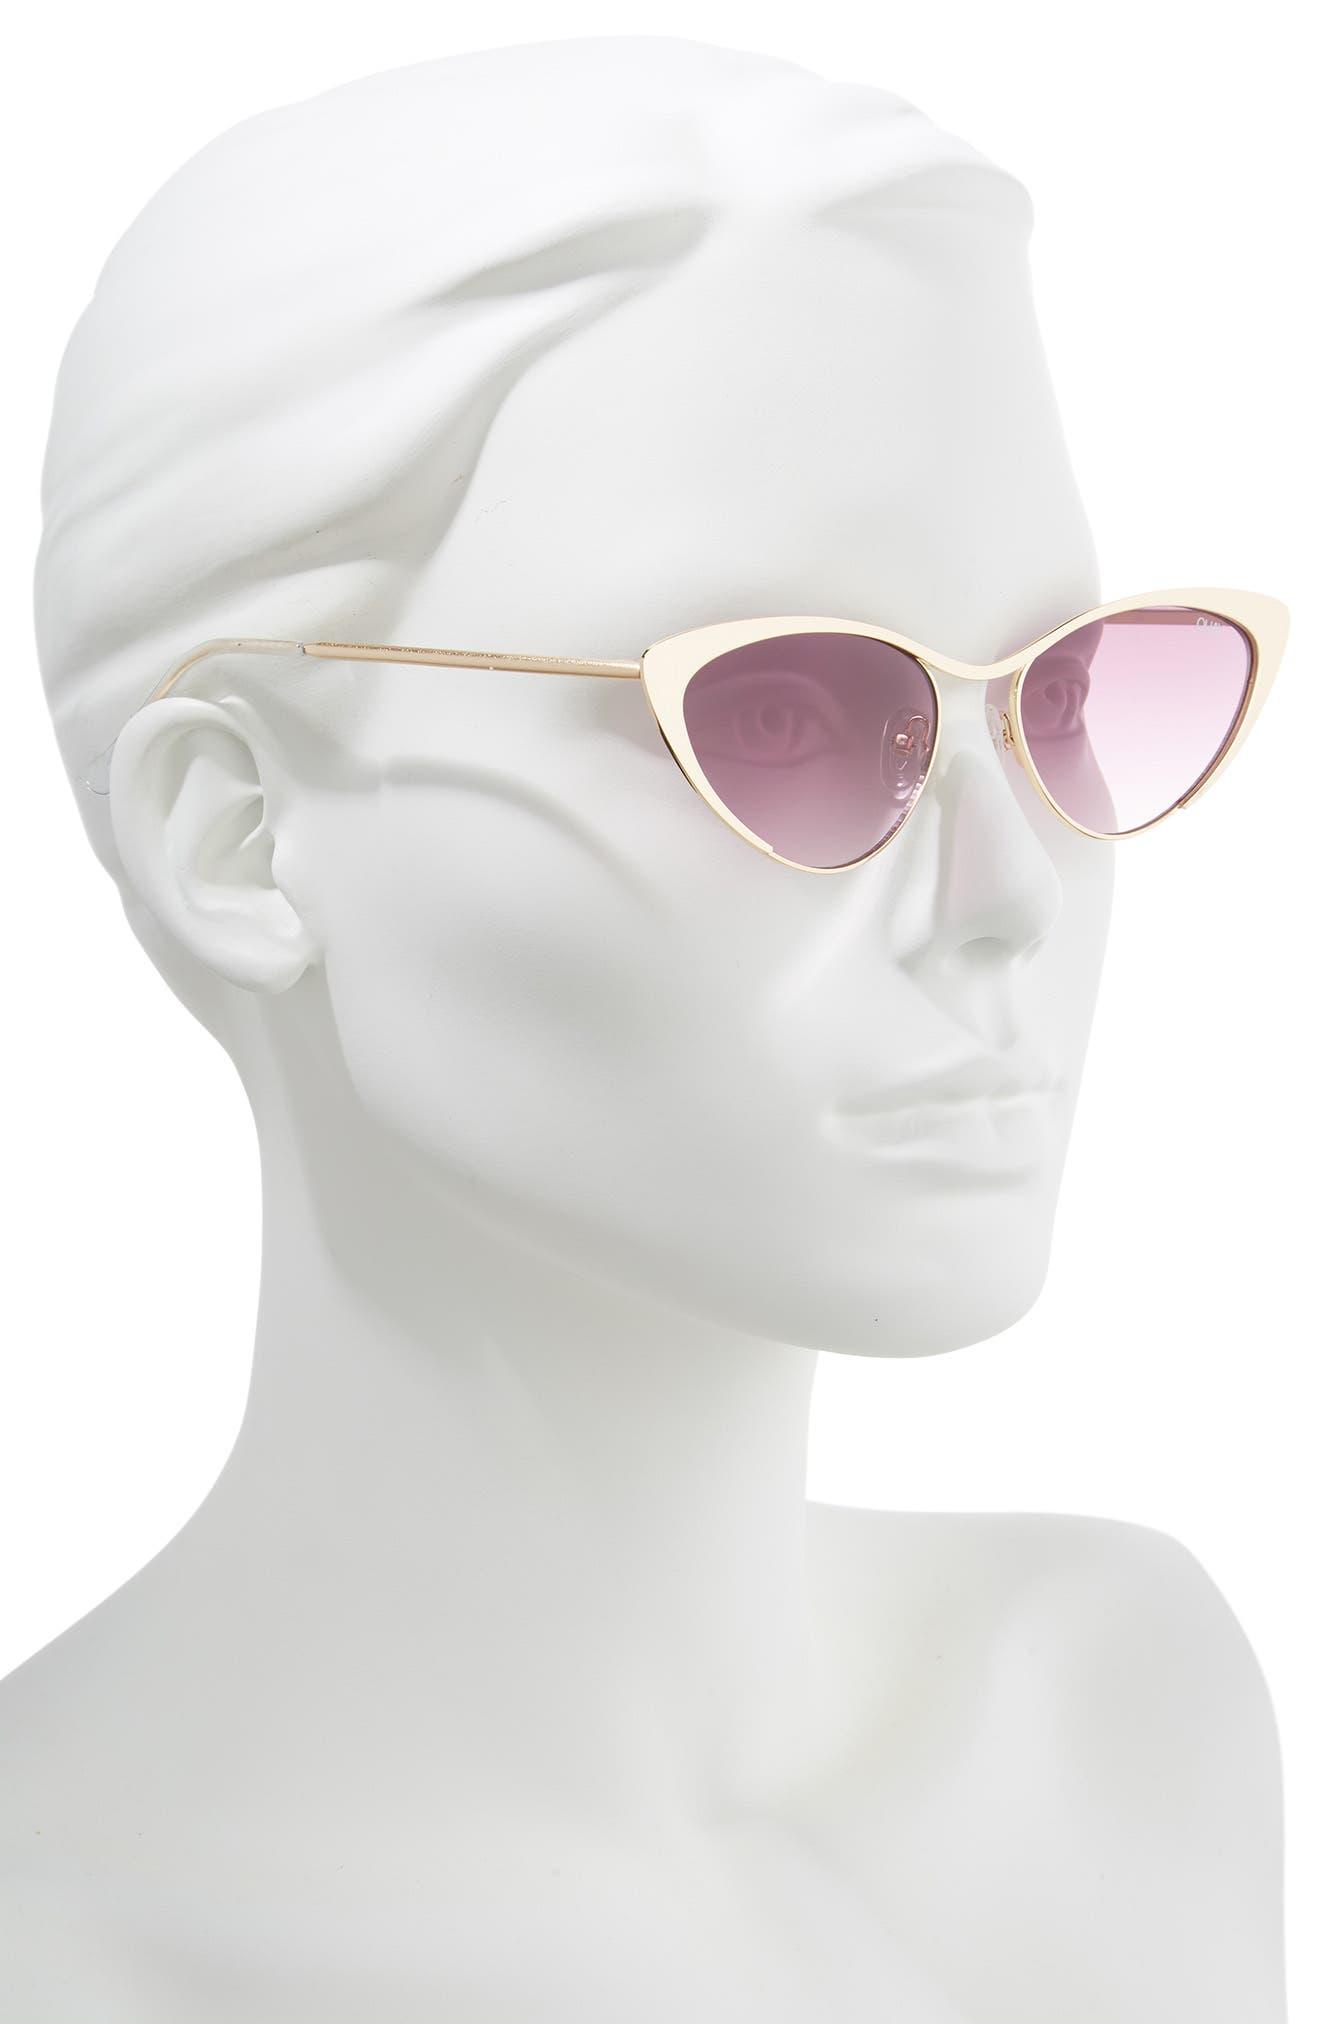 Boss 53mm Cat Eye Sunglasses,                             Alternate thumbnail 2, color,                             GOLD/ PURPLE